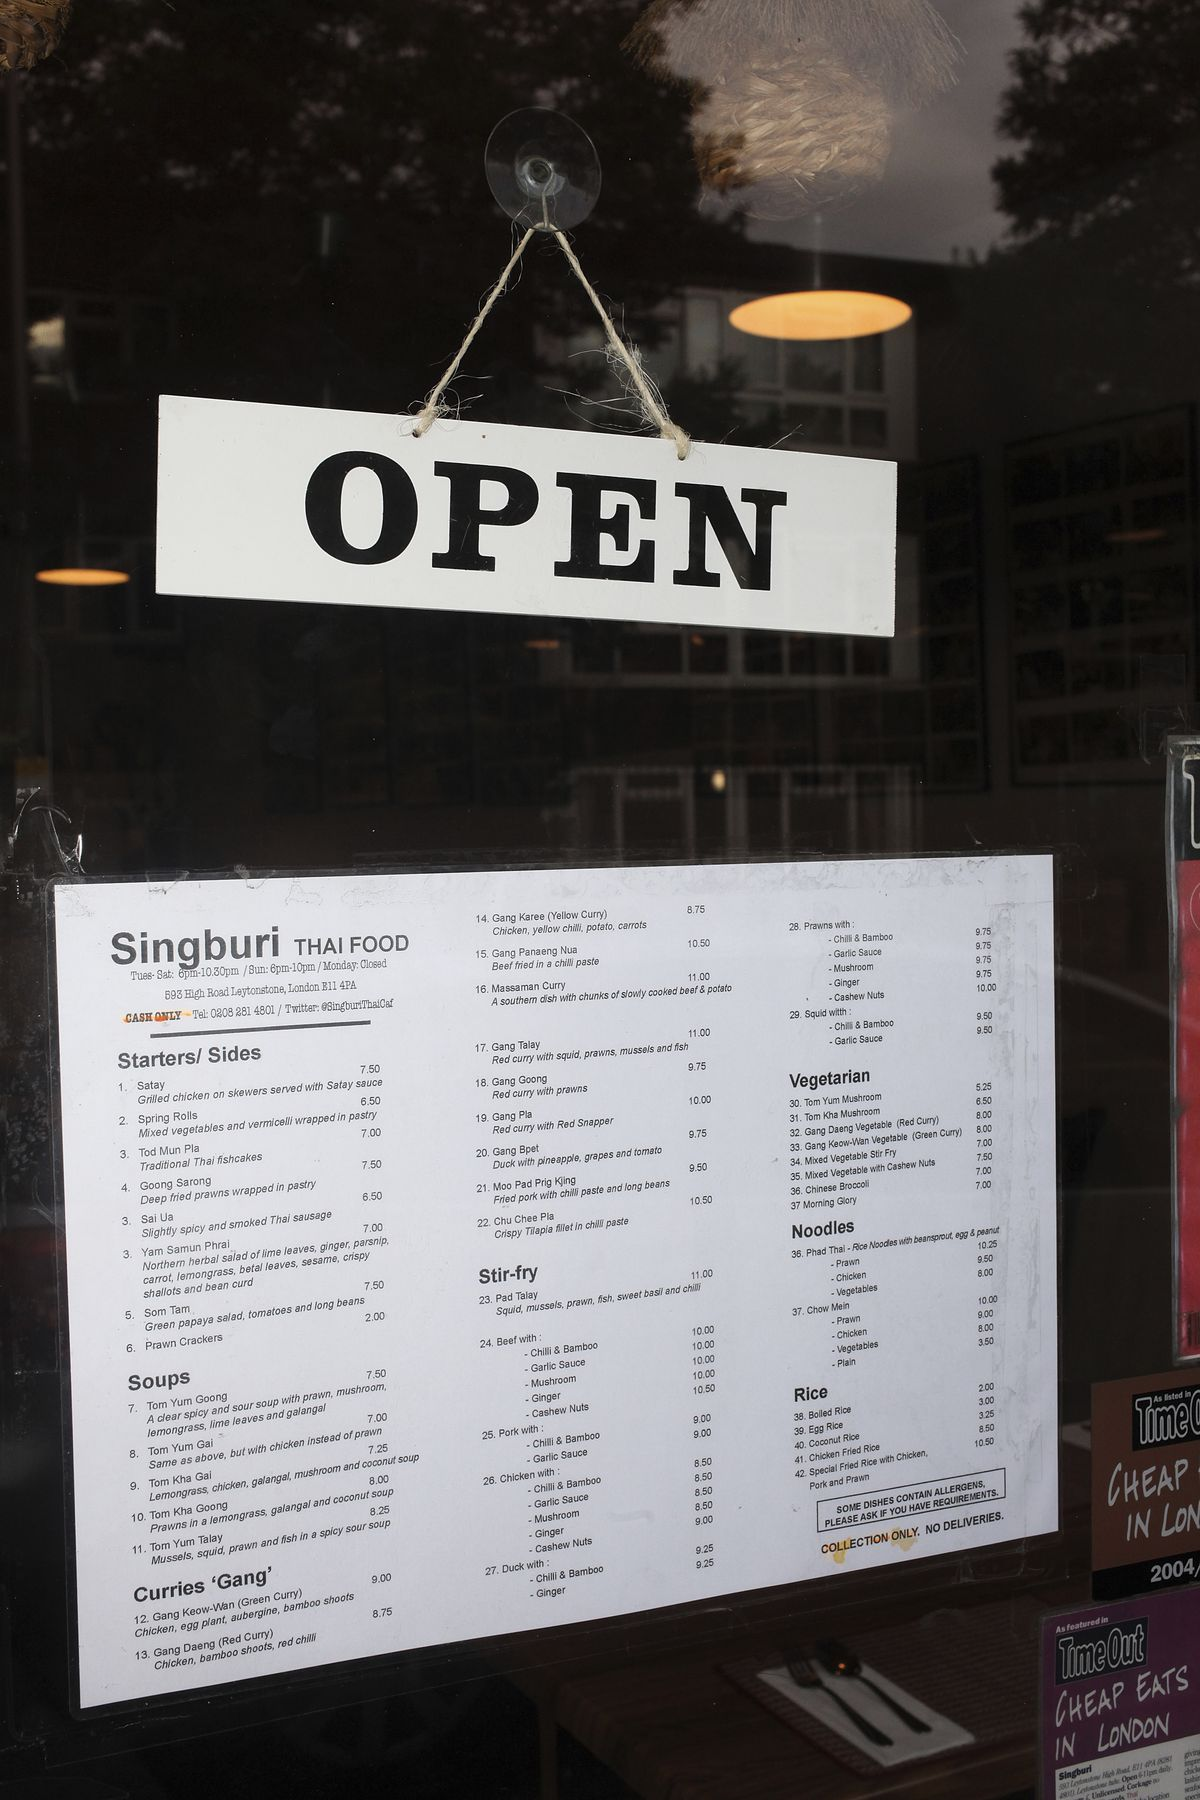 Singburi, one of the city's best Thai restaurants, reopens in London this week